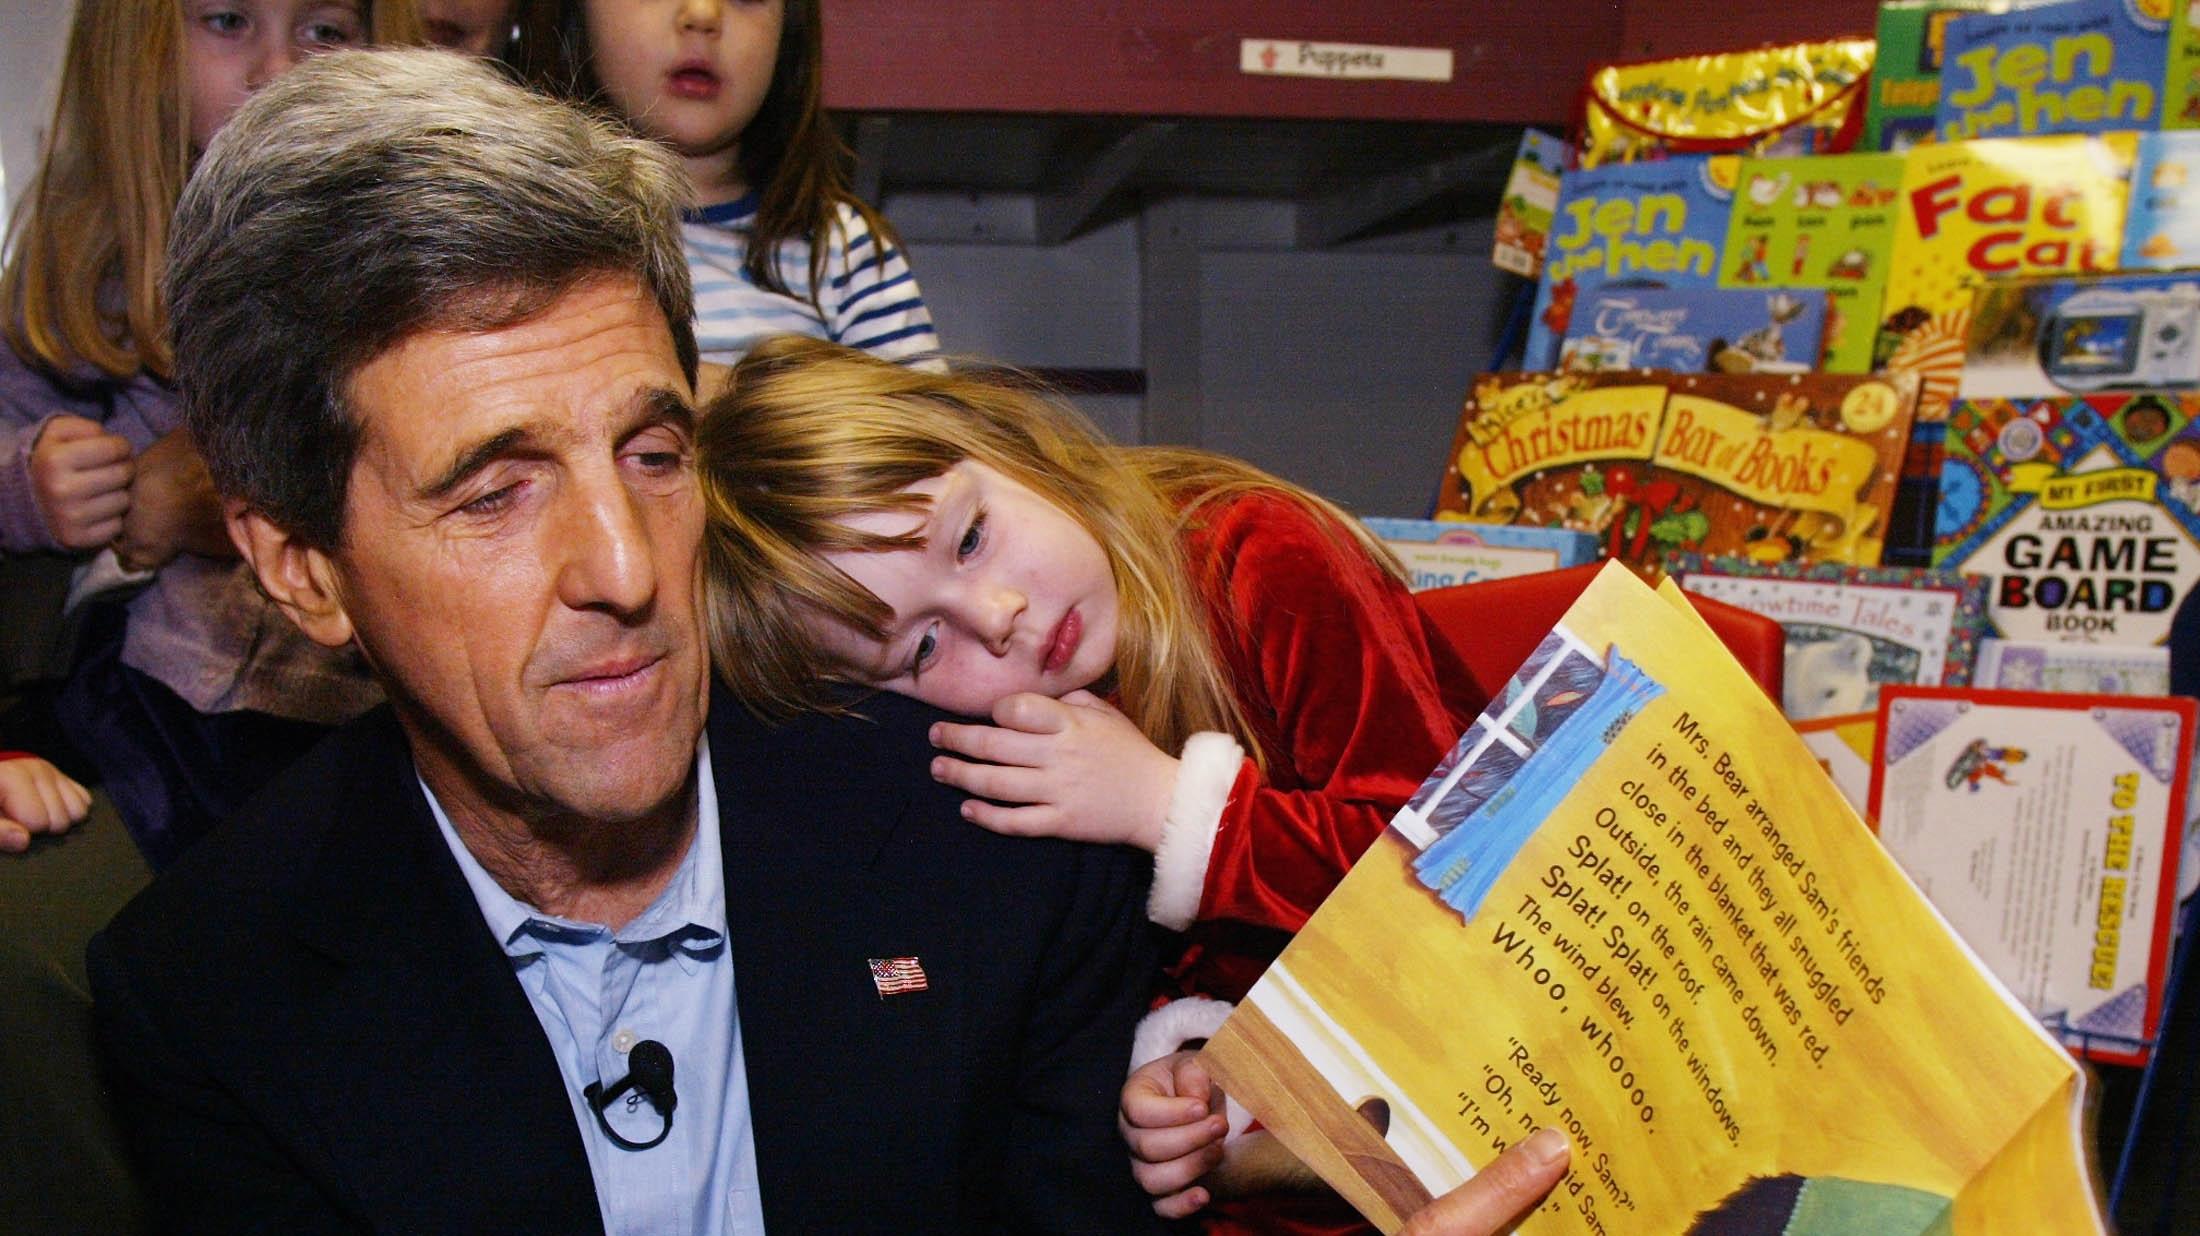 John Kerry reading a book to kids.